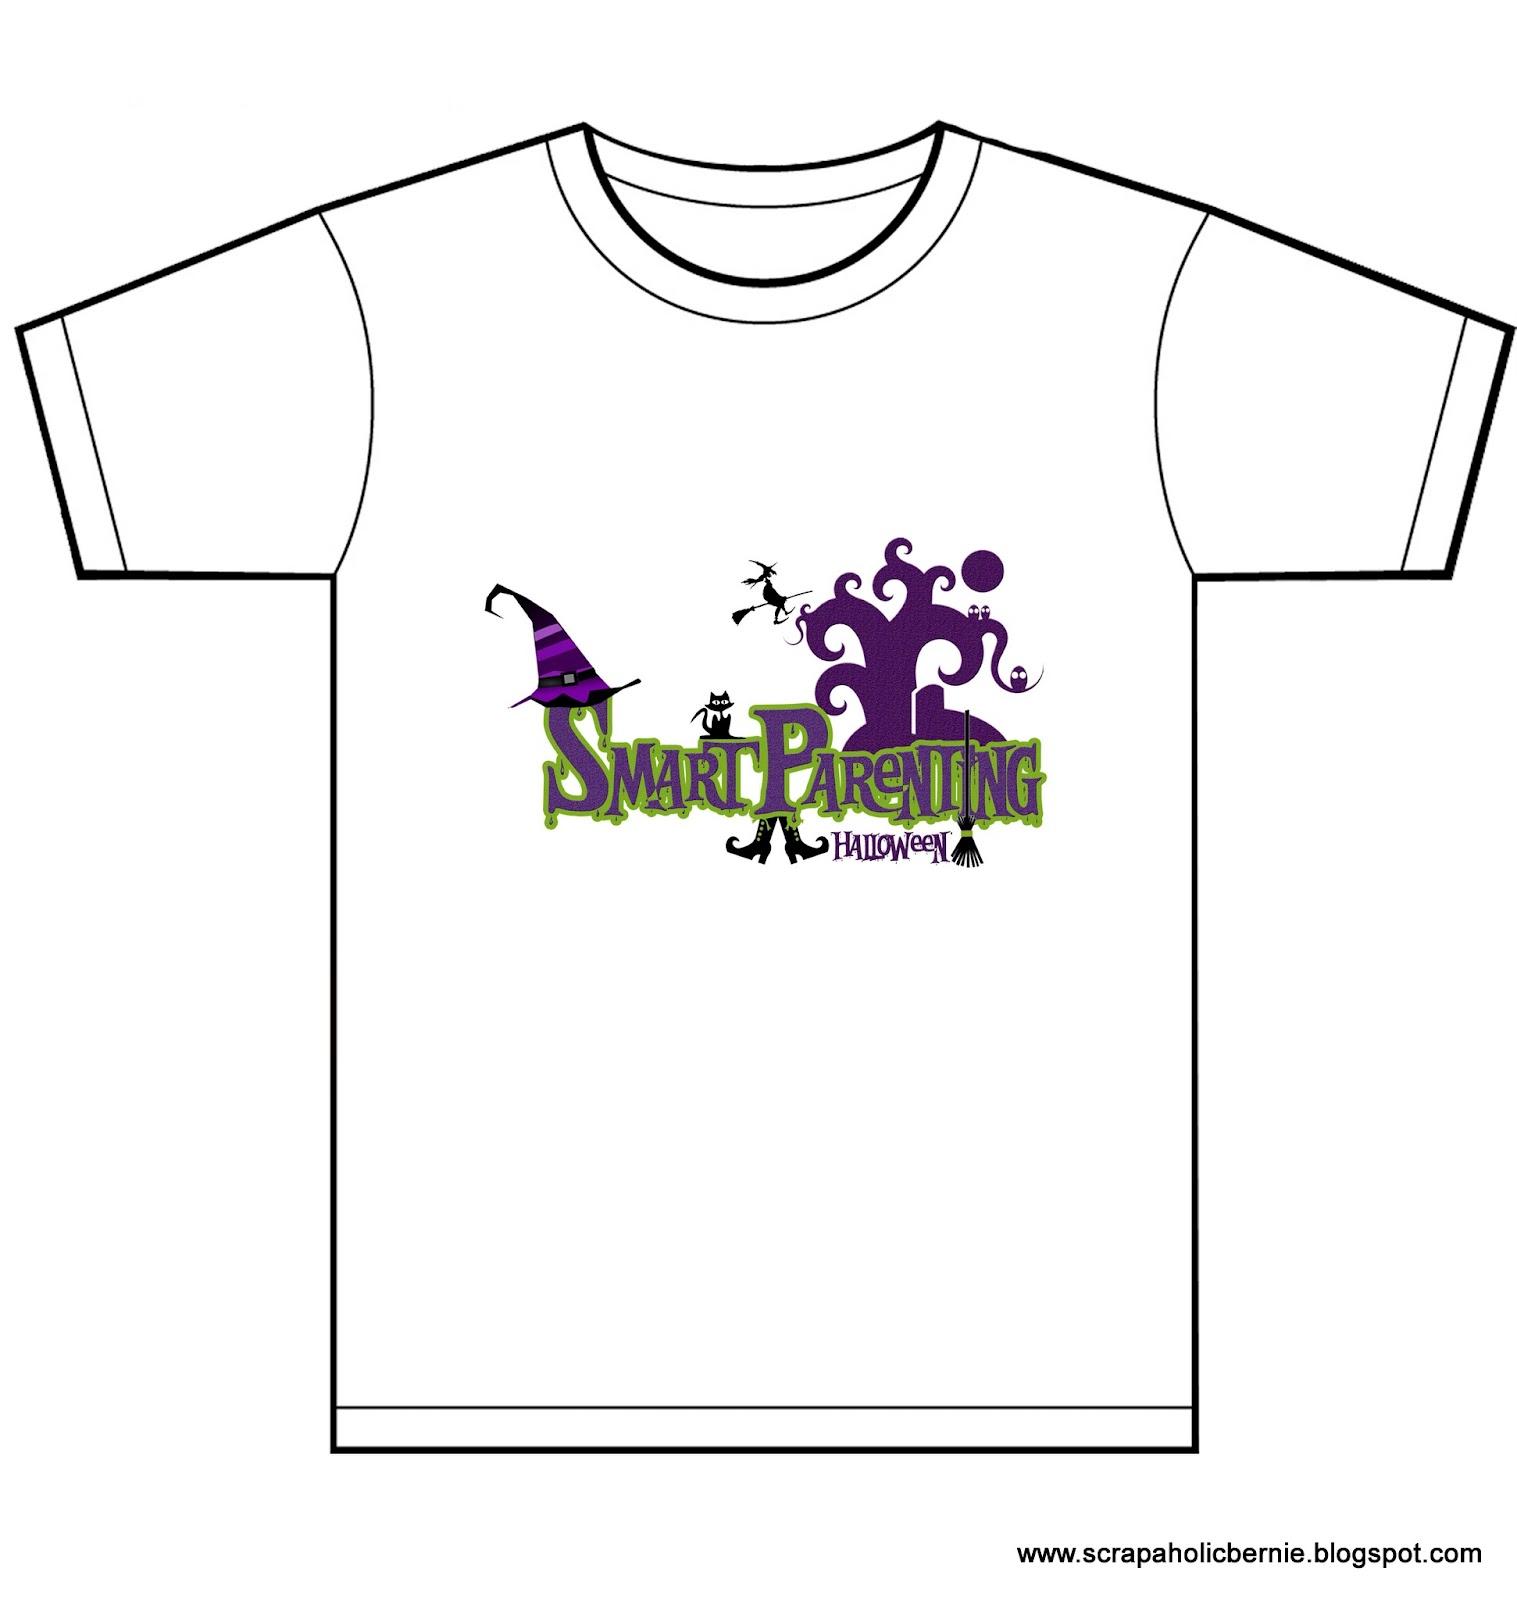 Shirt design layout - Smart Parenting Eb T Shirt Design In White